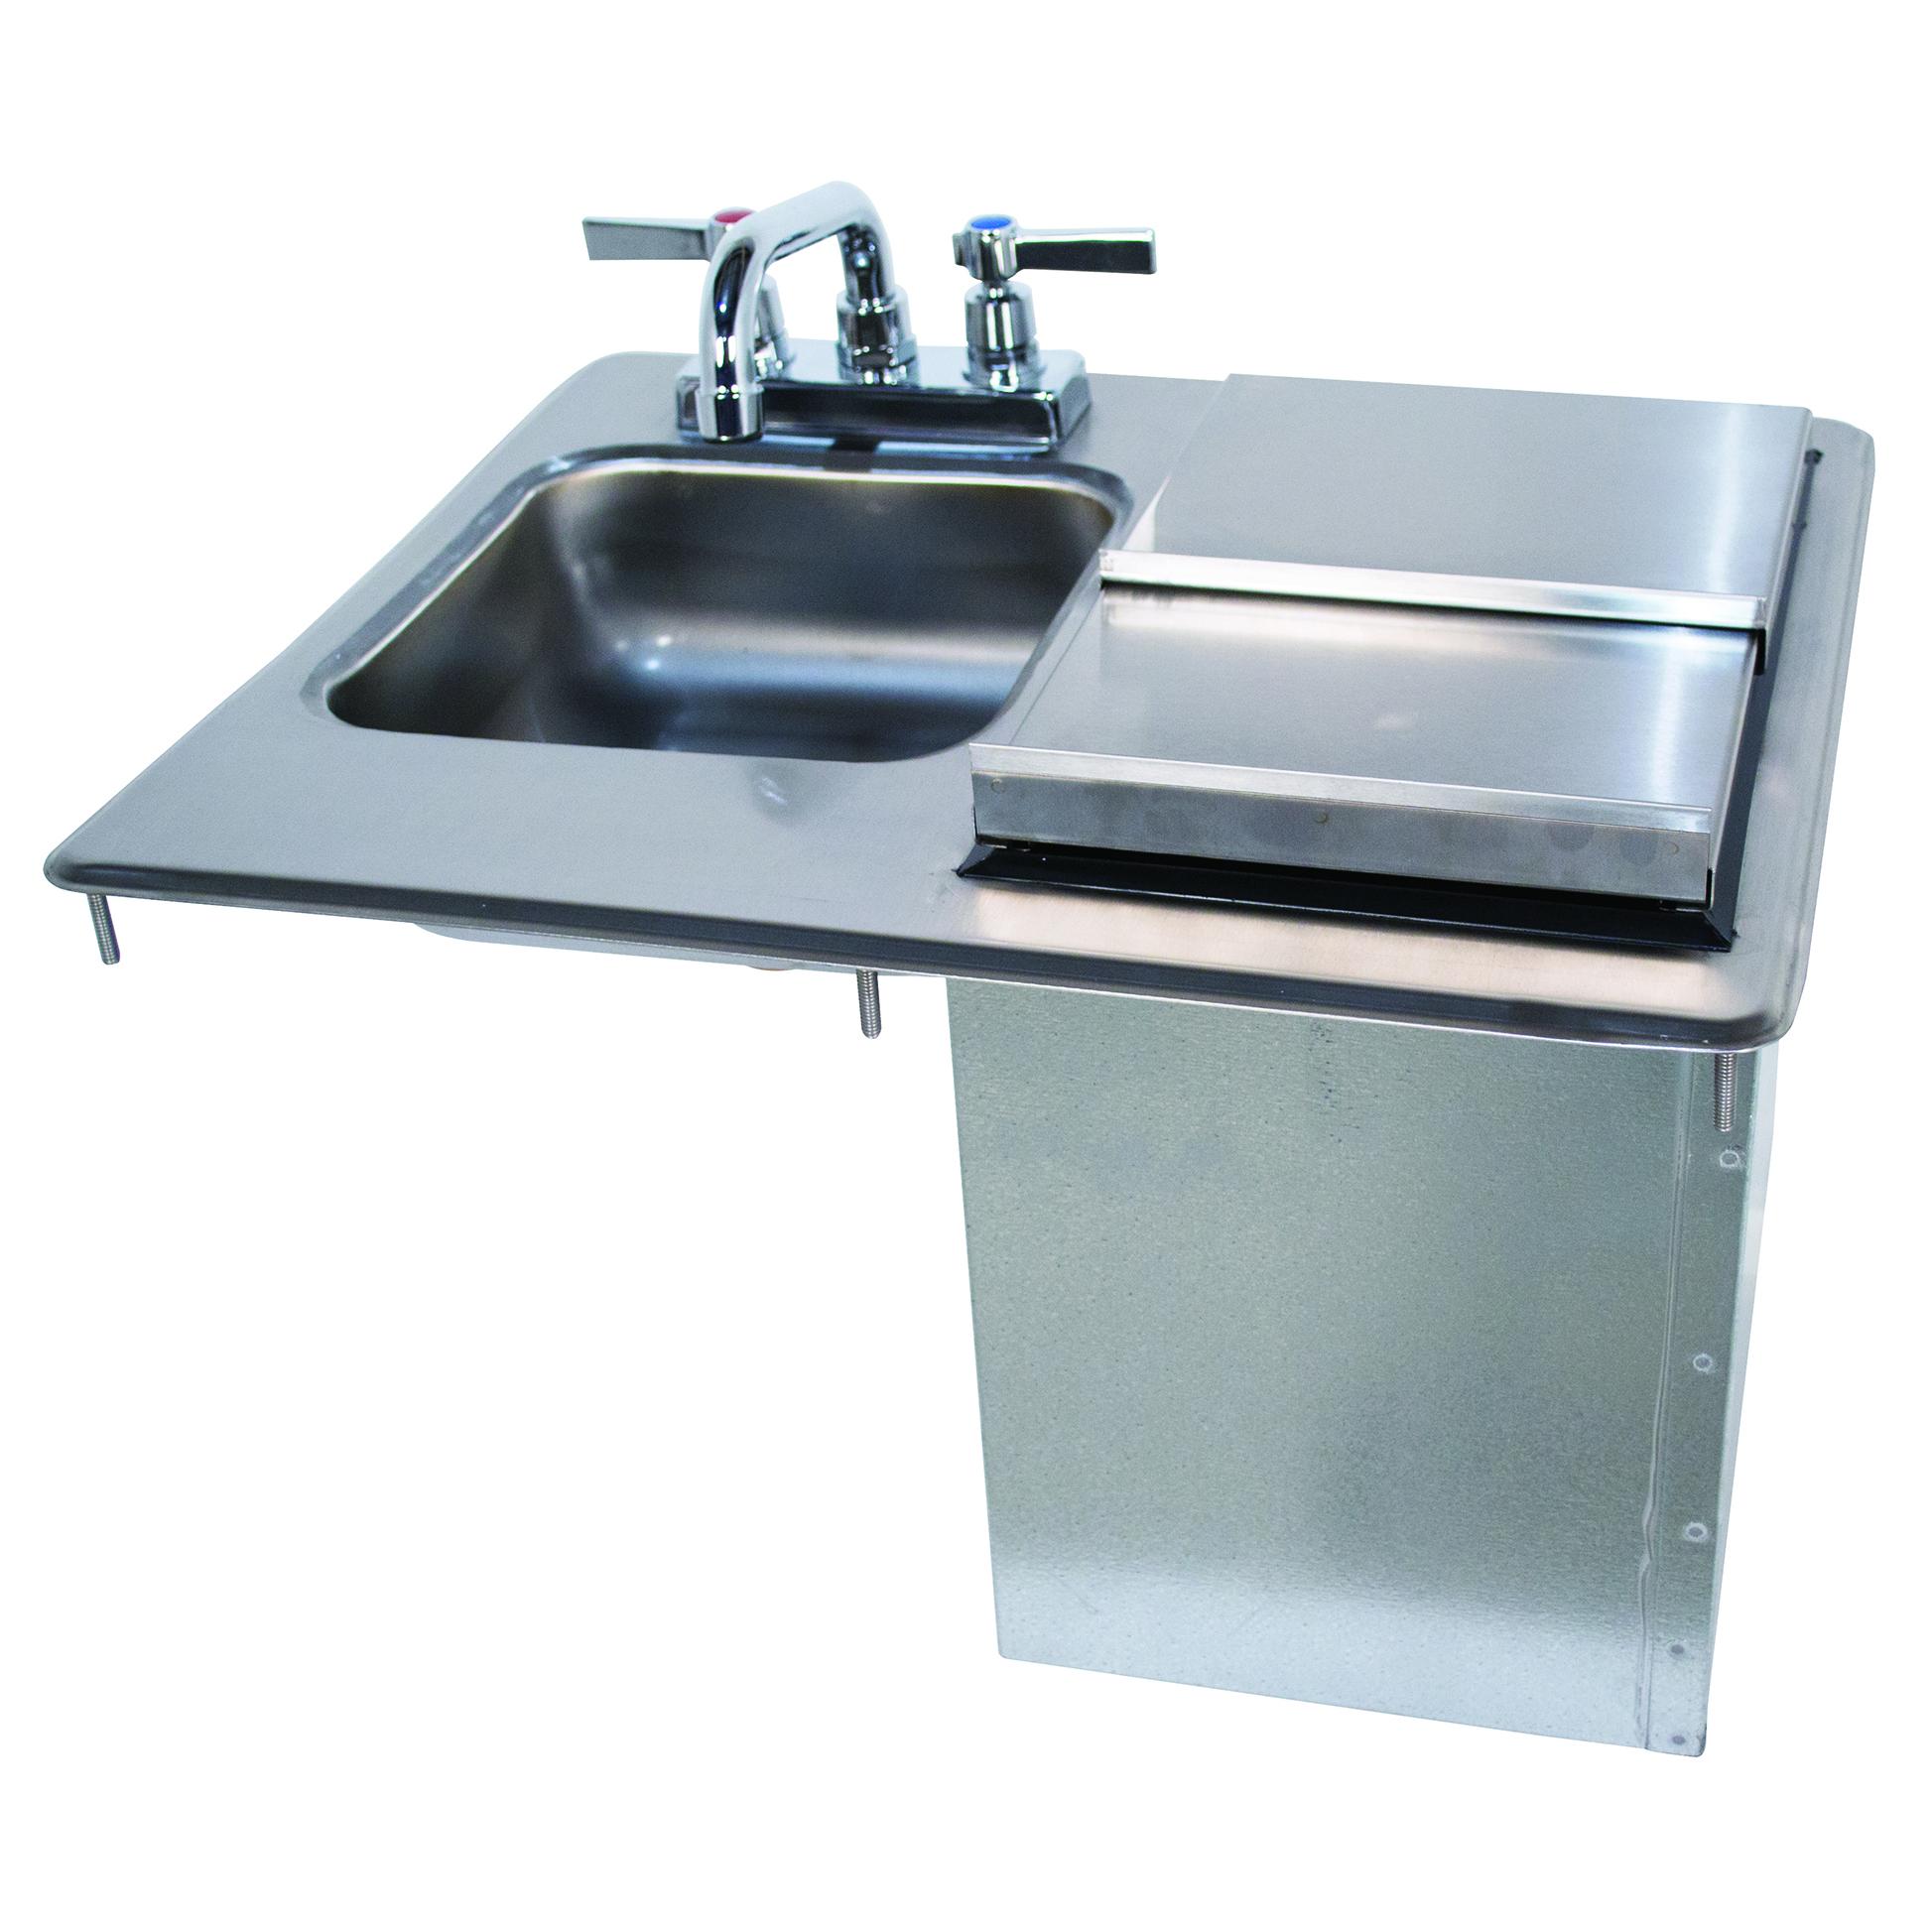 Advance Tabco D-24-SIBL sink, drop-in